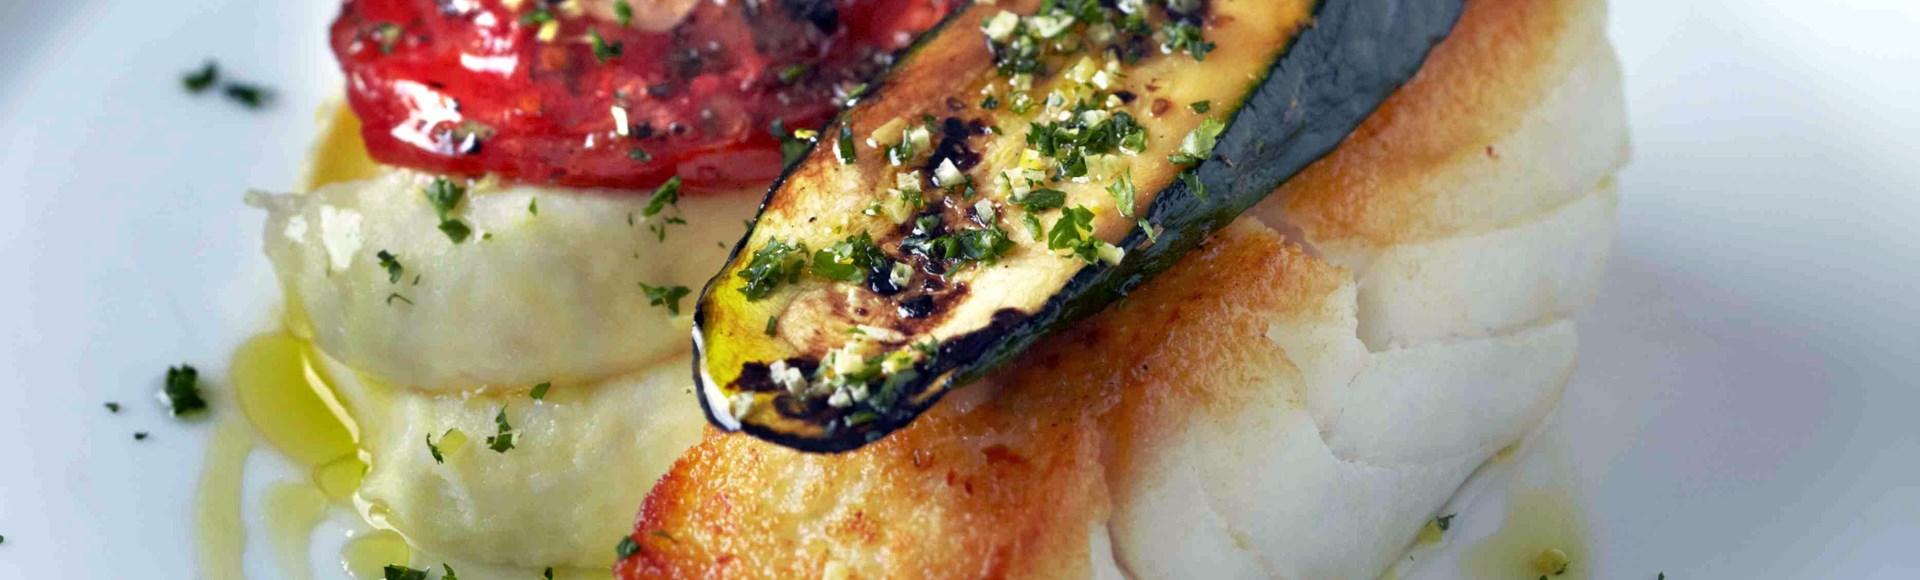 sea-food-menu-2-alargo-private-chef-manos-agios-nikolaos - Private Chef Service For Villas in Lasithi, Crete